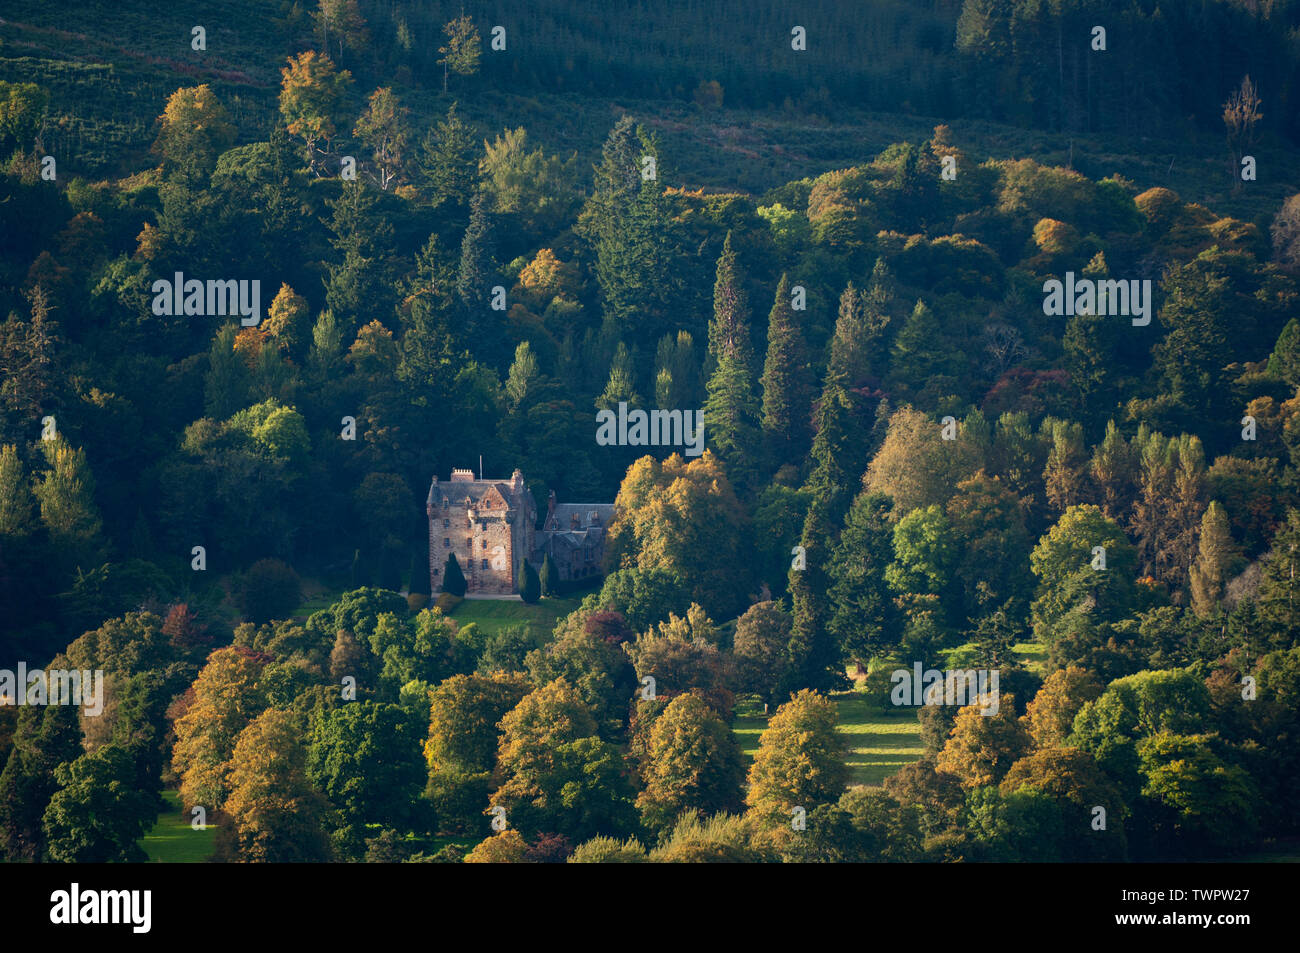 Castle Leod - Strathpeffer, Ross-shire, Scotland. Stock Photo